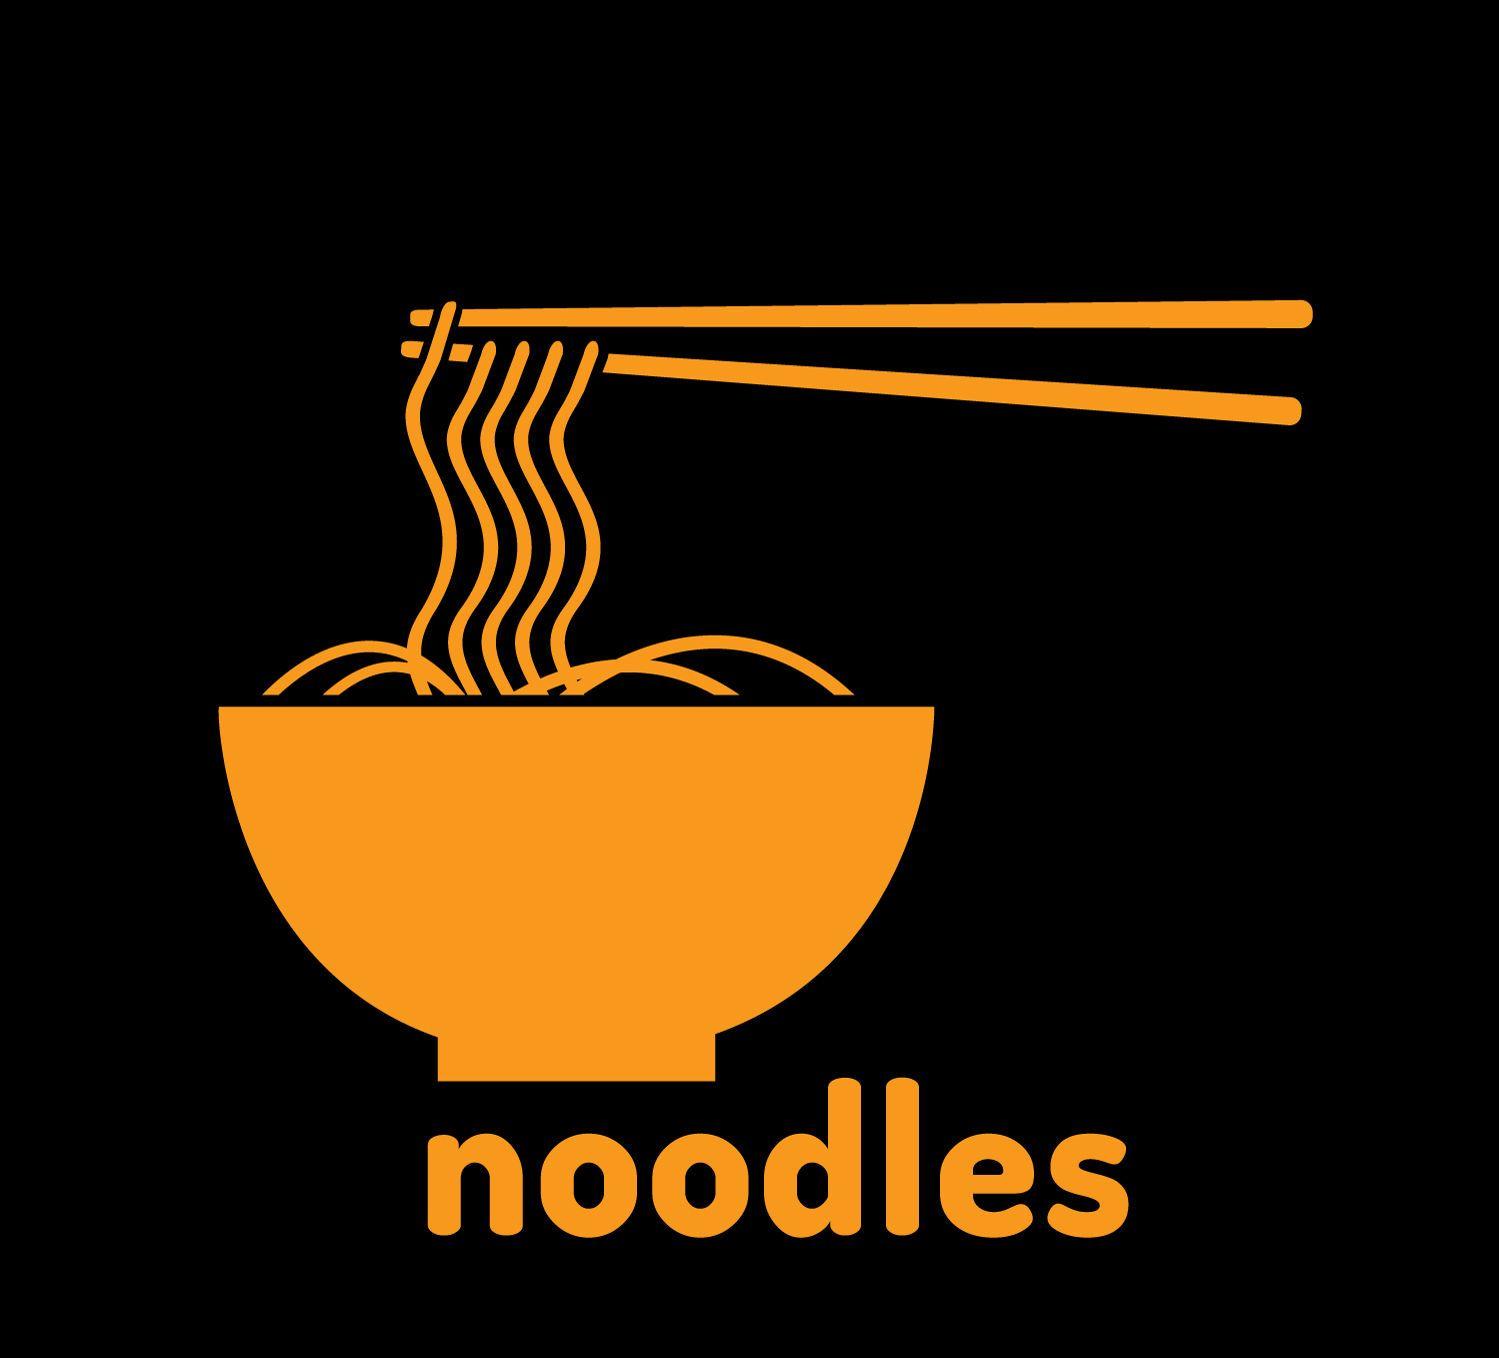 Noodles bowl vector logo